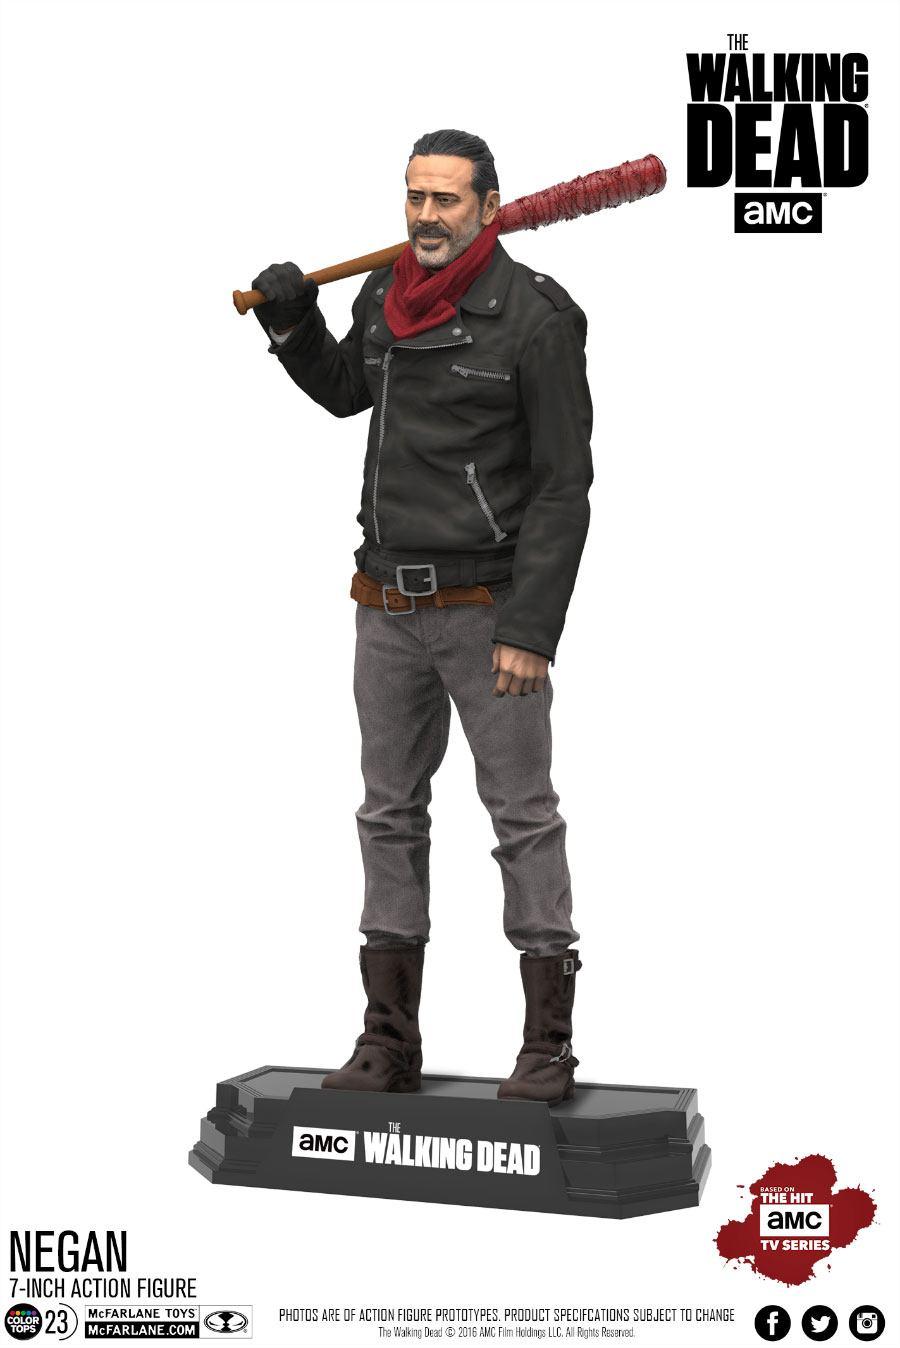 The Walking Dead TV Version Action Figure Negan 18 cm